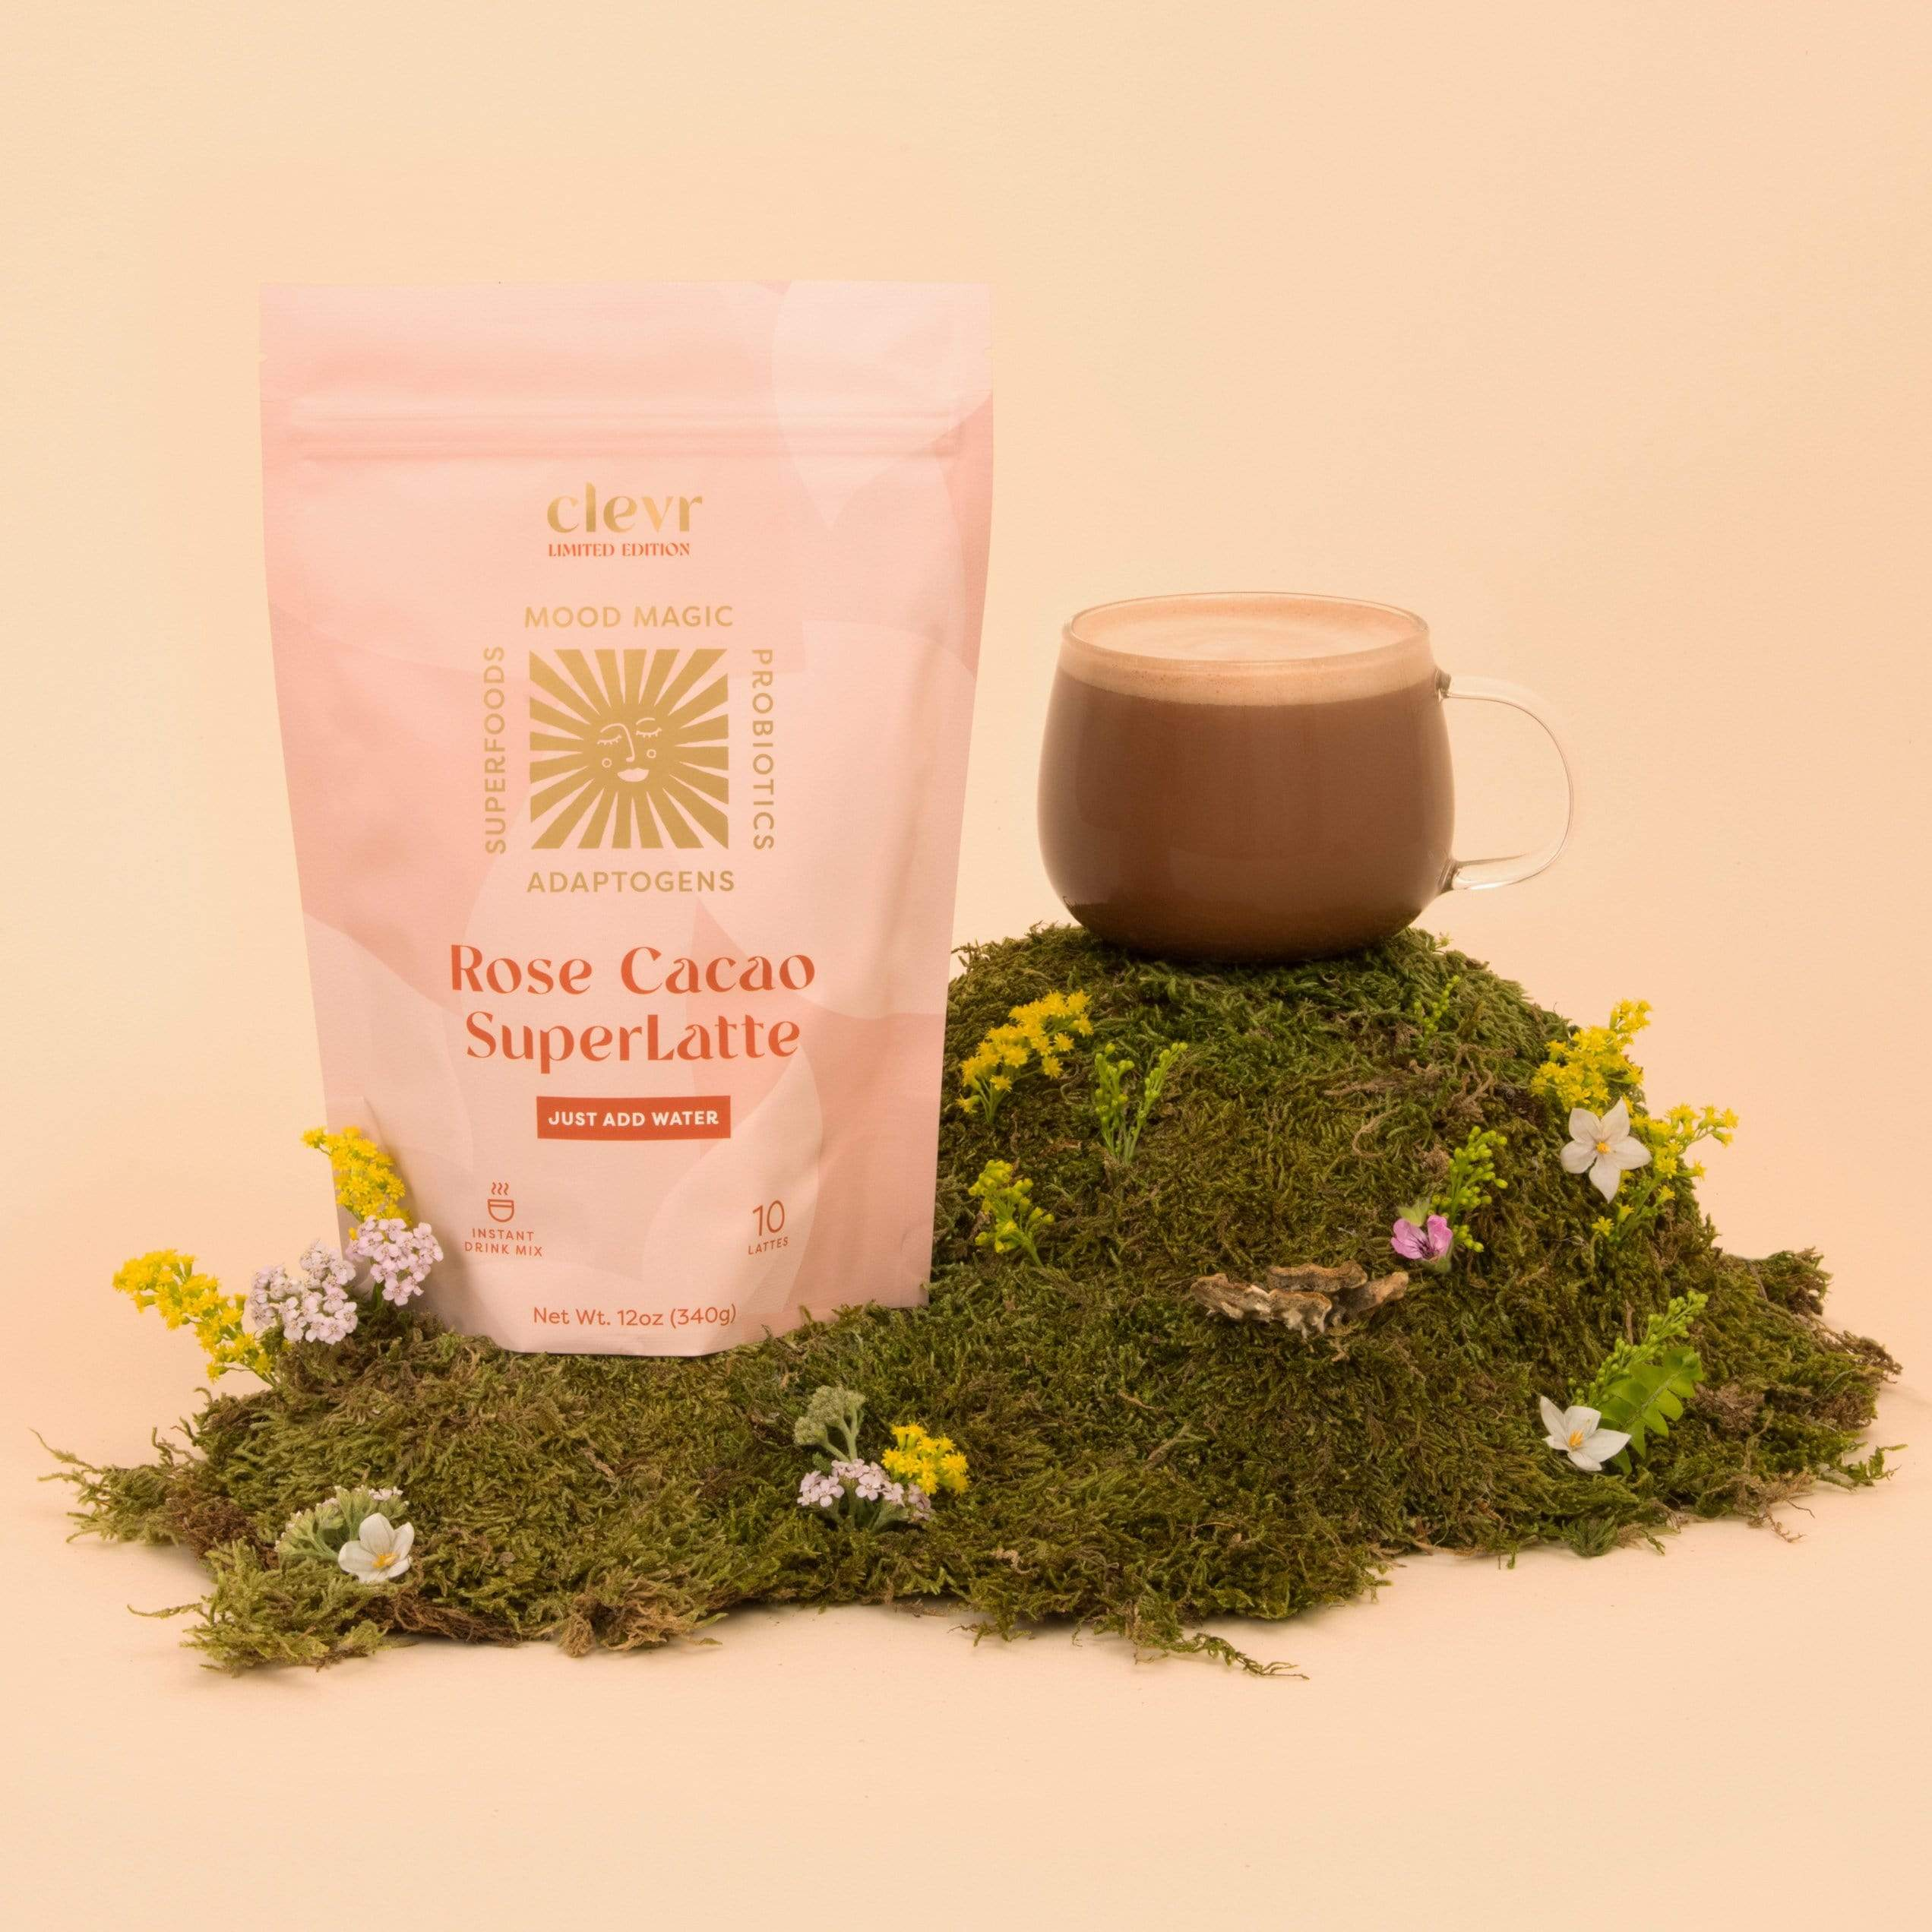 Rose Cacao SuperLatte